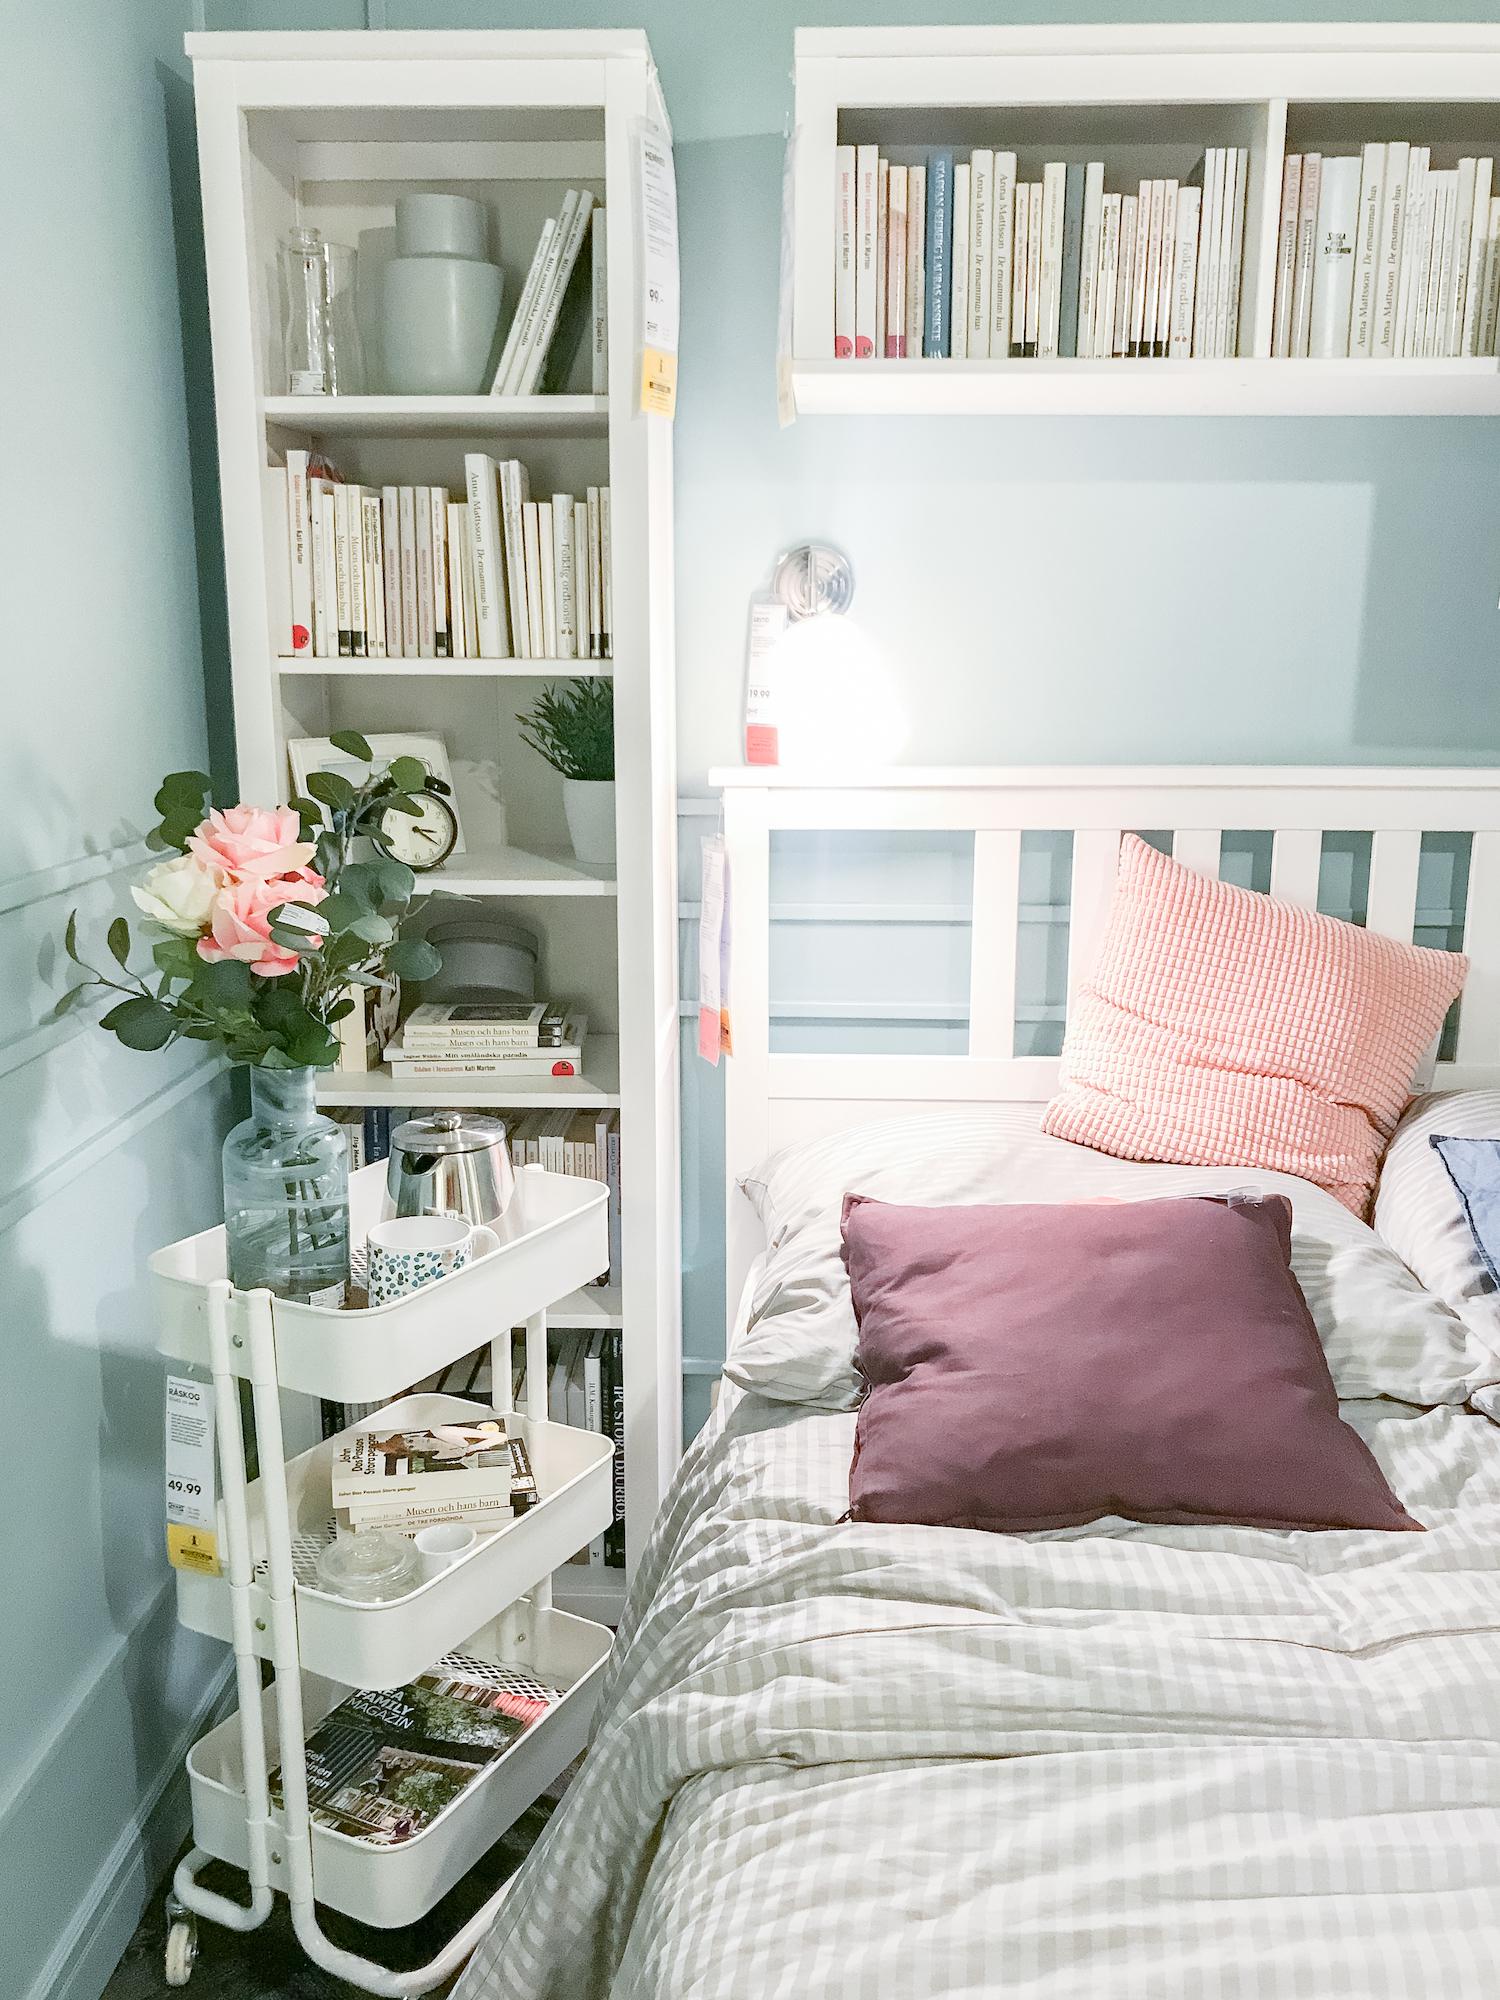 IKEA Ludwigsburg | Neuheiten & Inspirationen